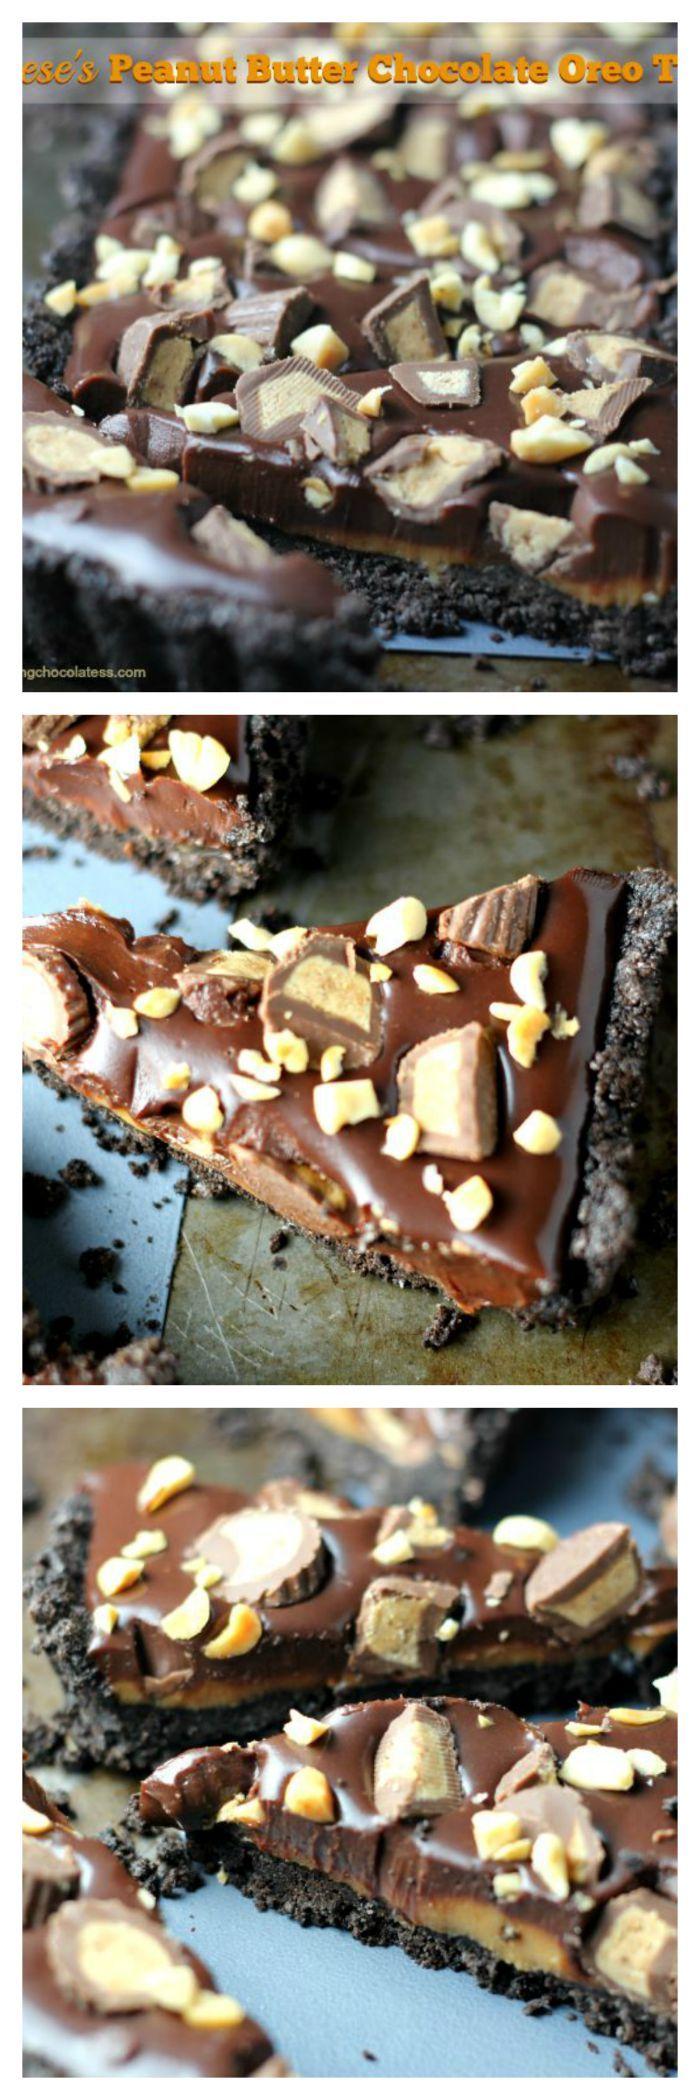 Reese's Peanut Butter Chocolate Oreo Tart – The Baking ChocolaTess